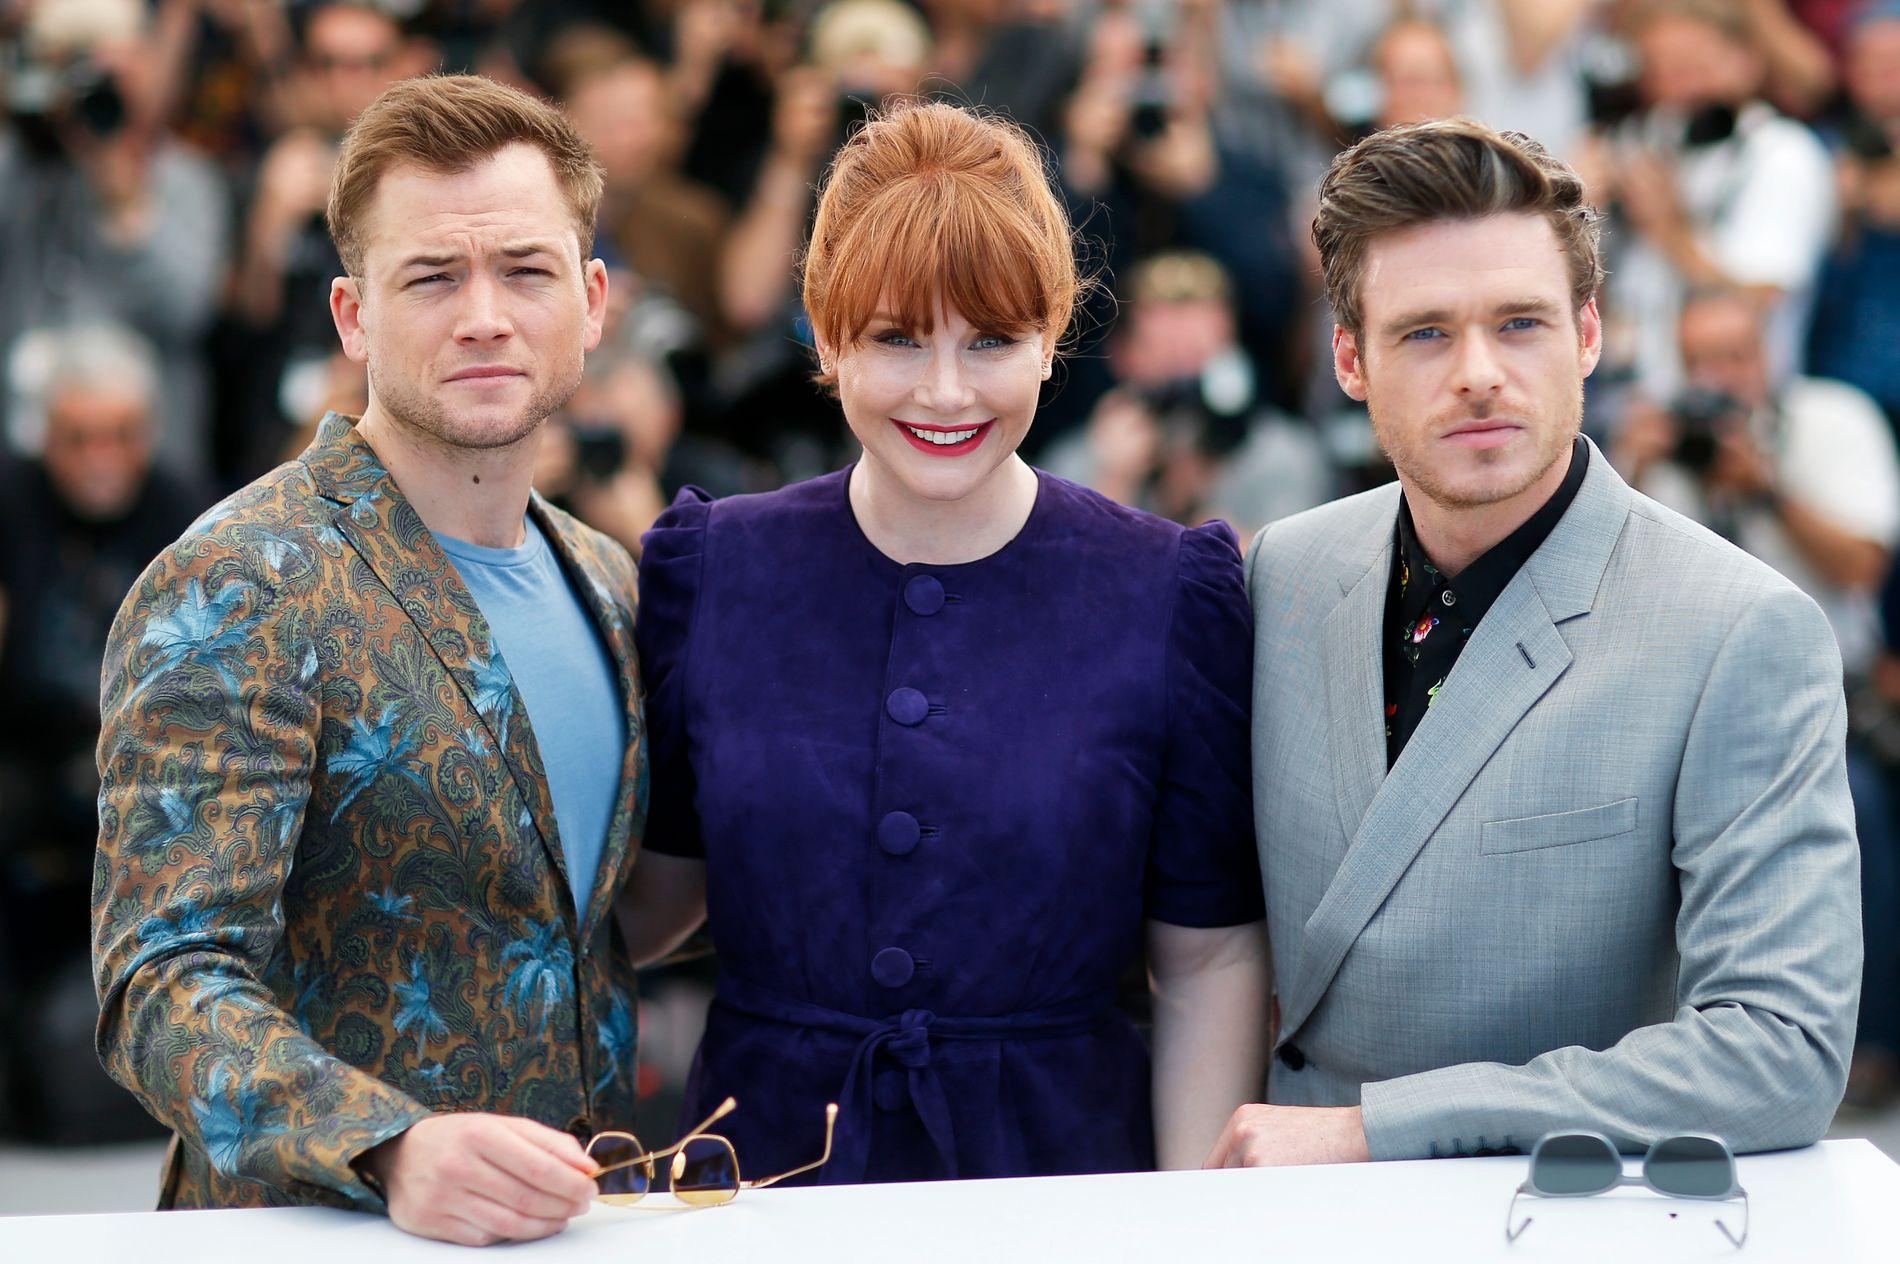 CANNES: Taron Egerton, Bryce Dallas Howard og Richard Madden i Cannes før premieren på «Rocketman» under filmfestivalen.